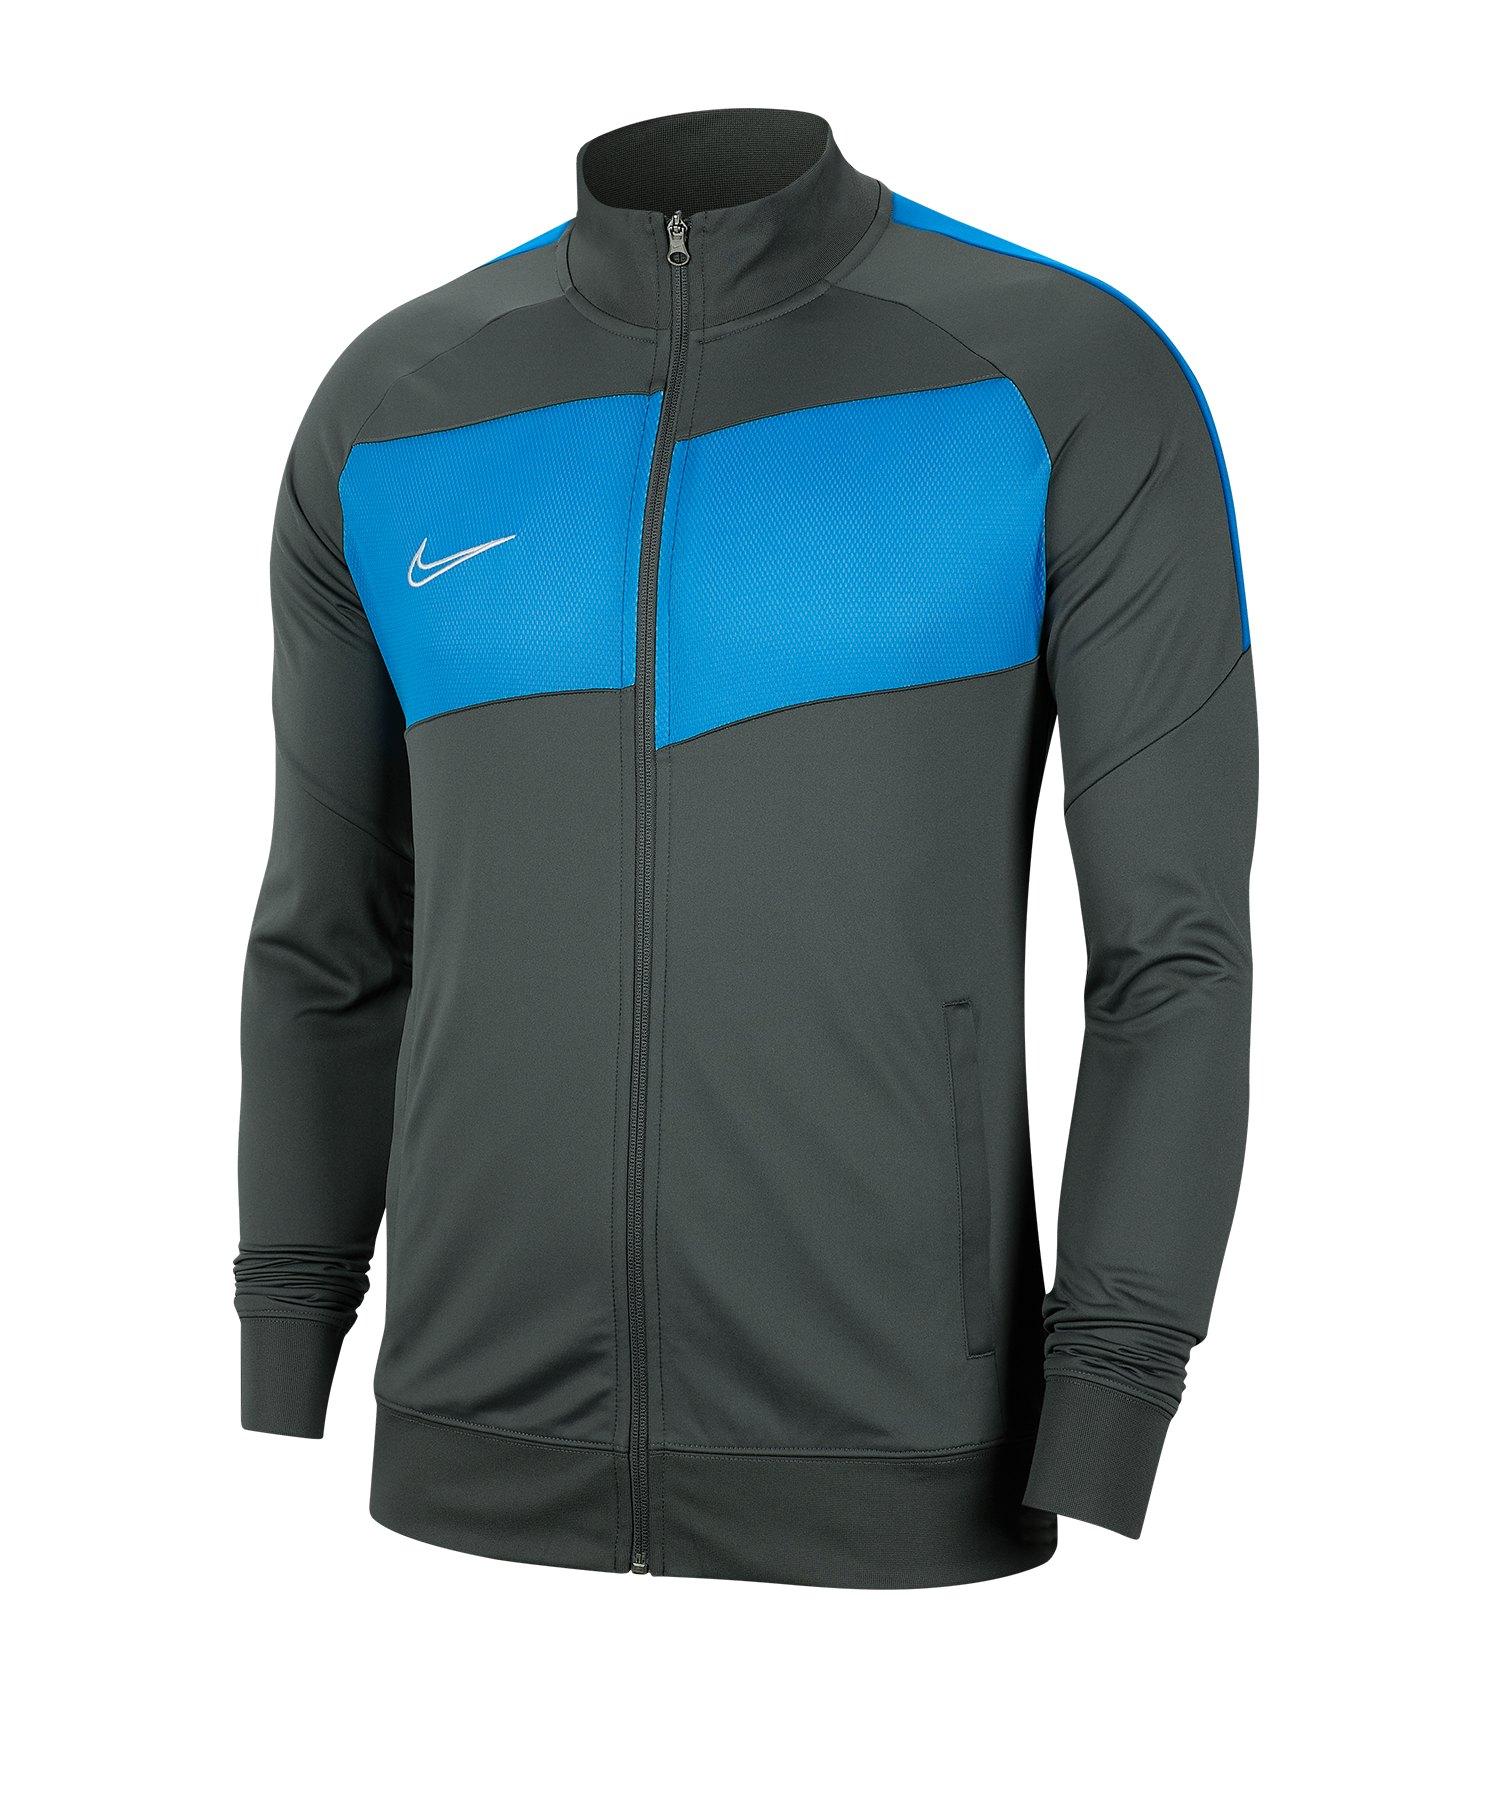 Nike Academy Pro Trainingsjacke Grau Blau F067 - grau